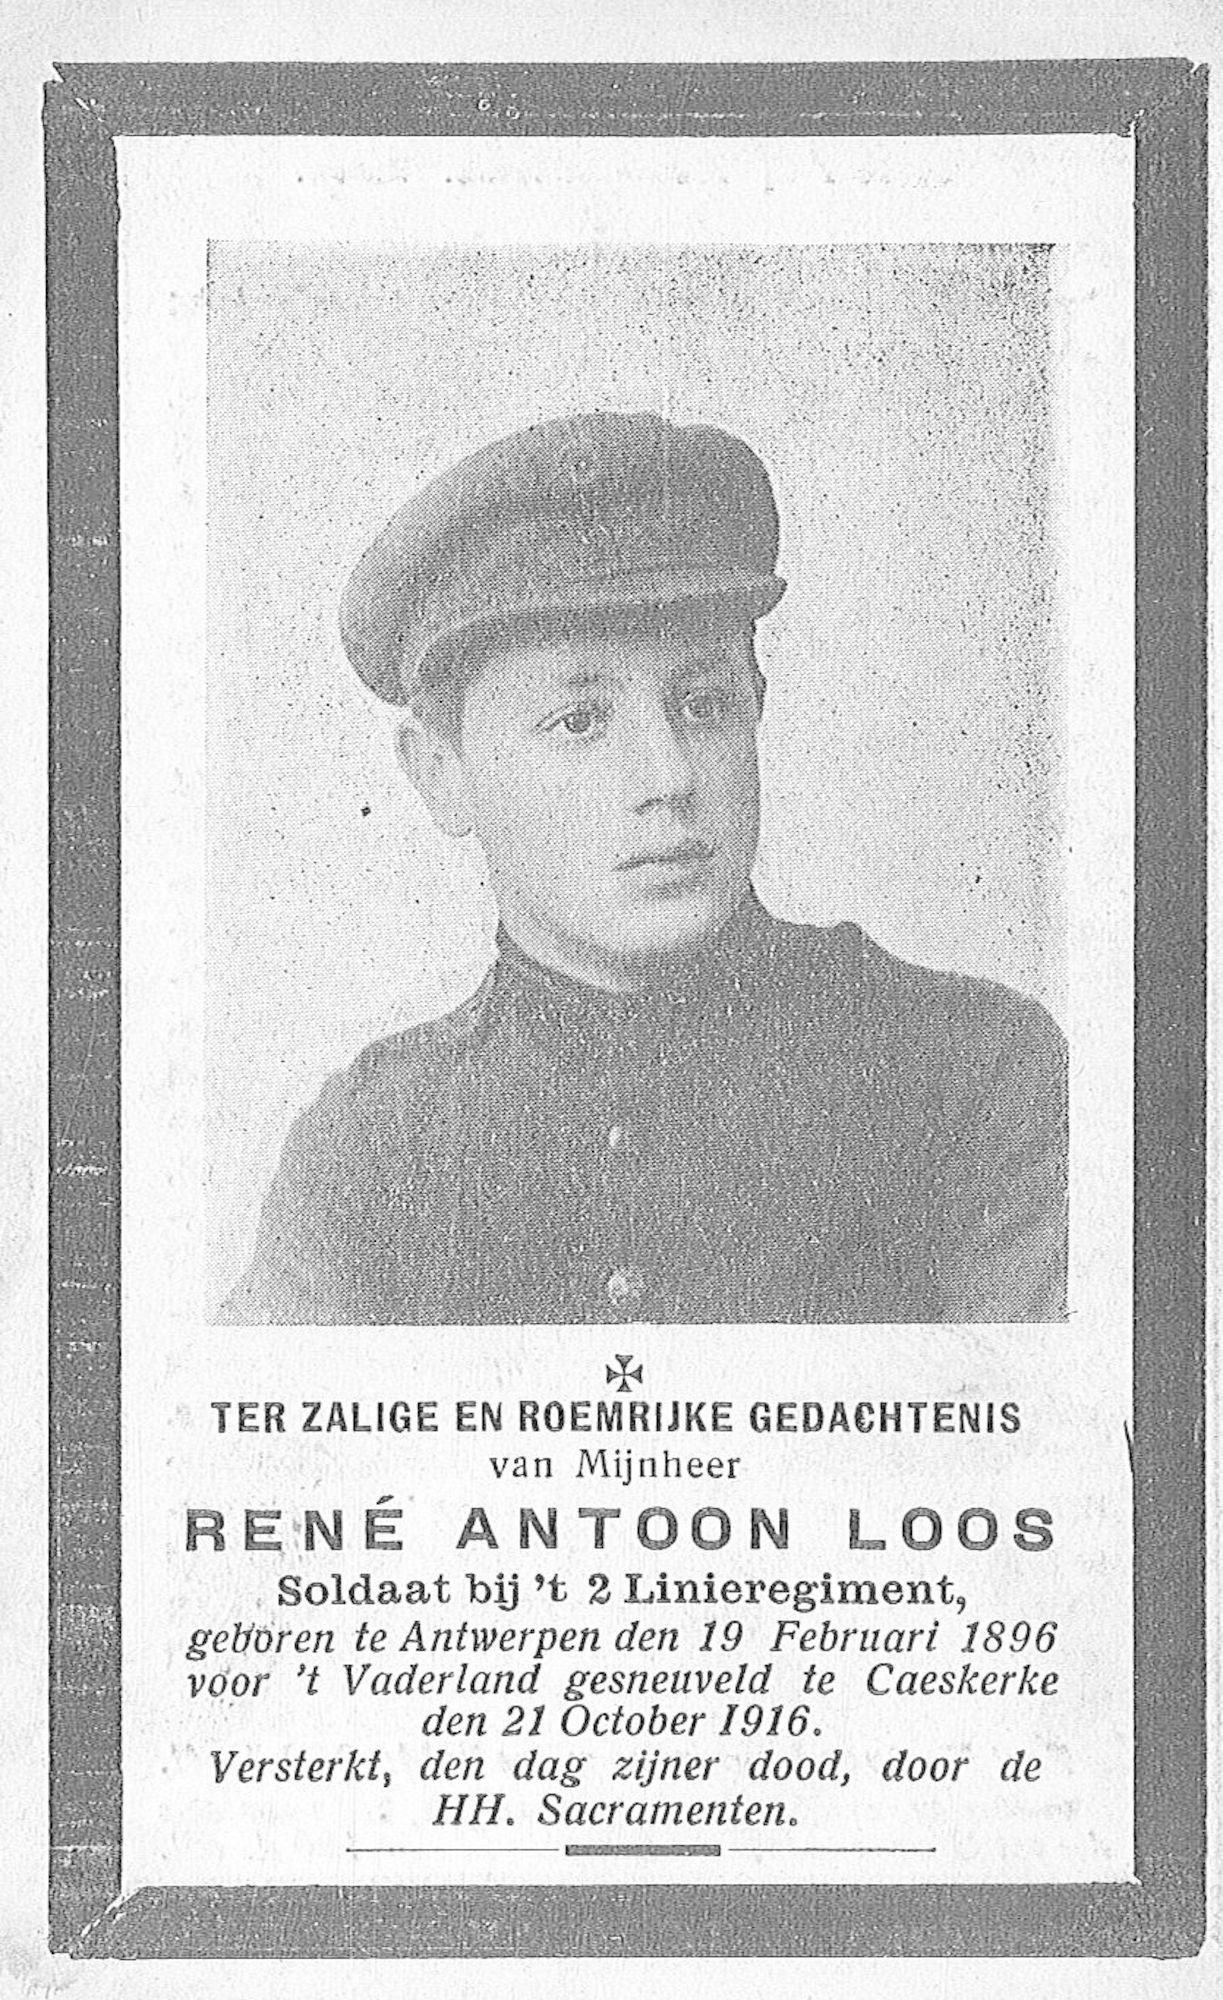 René Antoon Loos